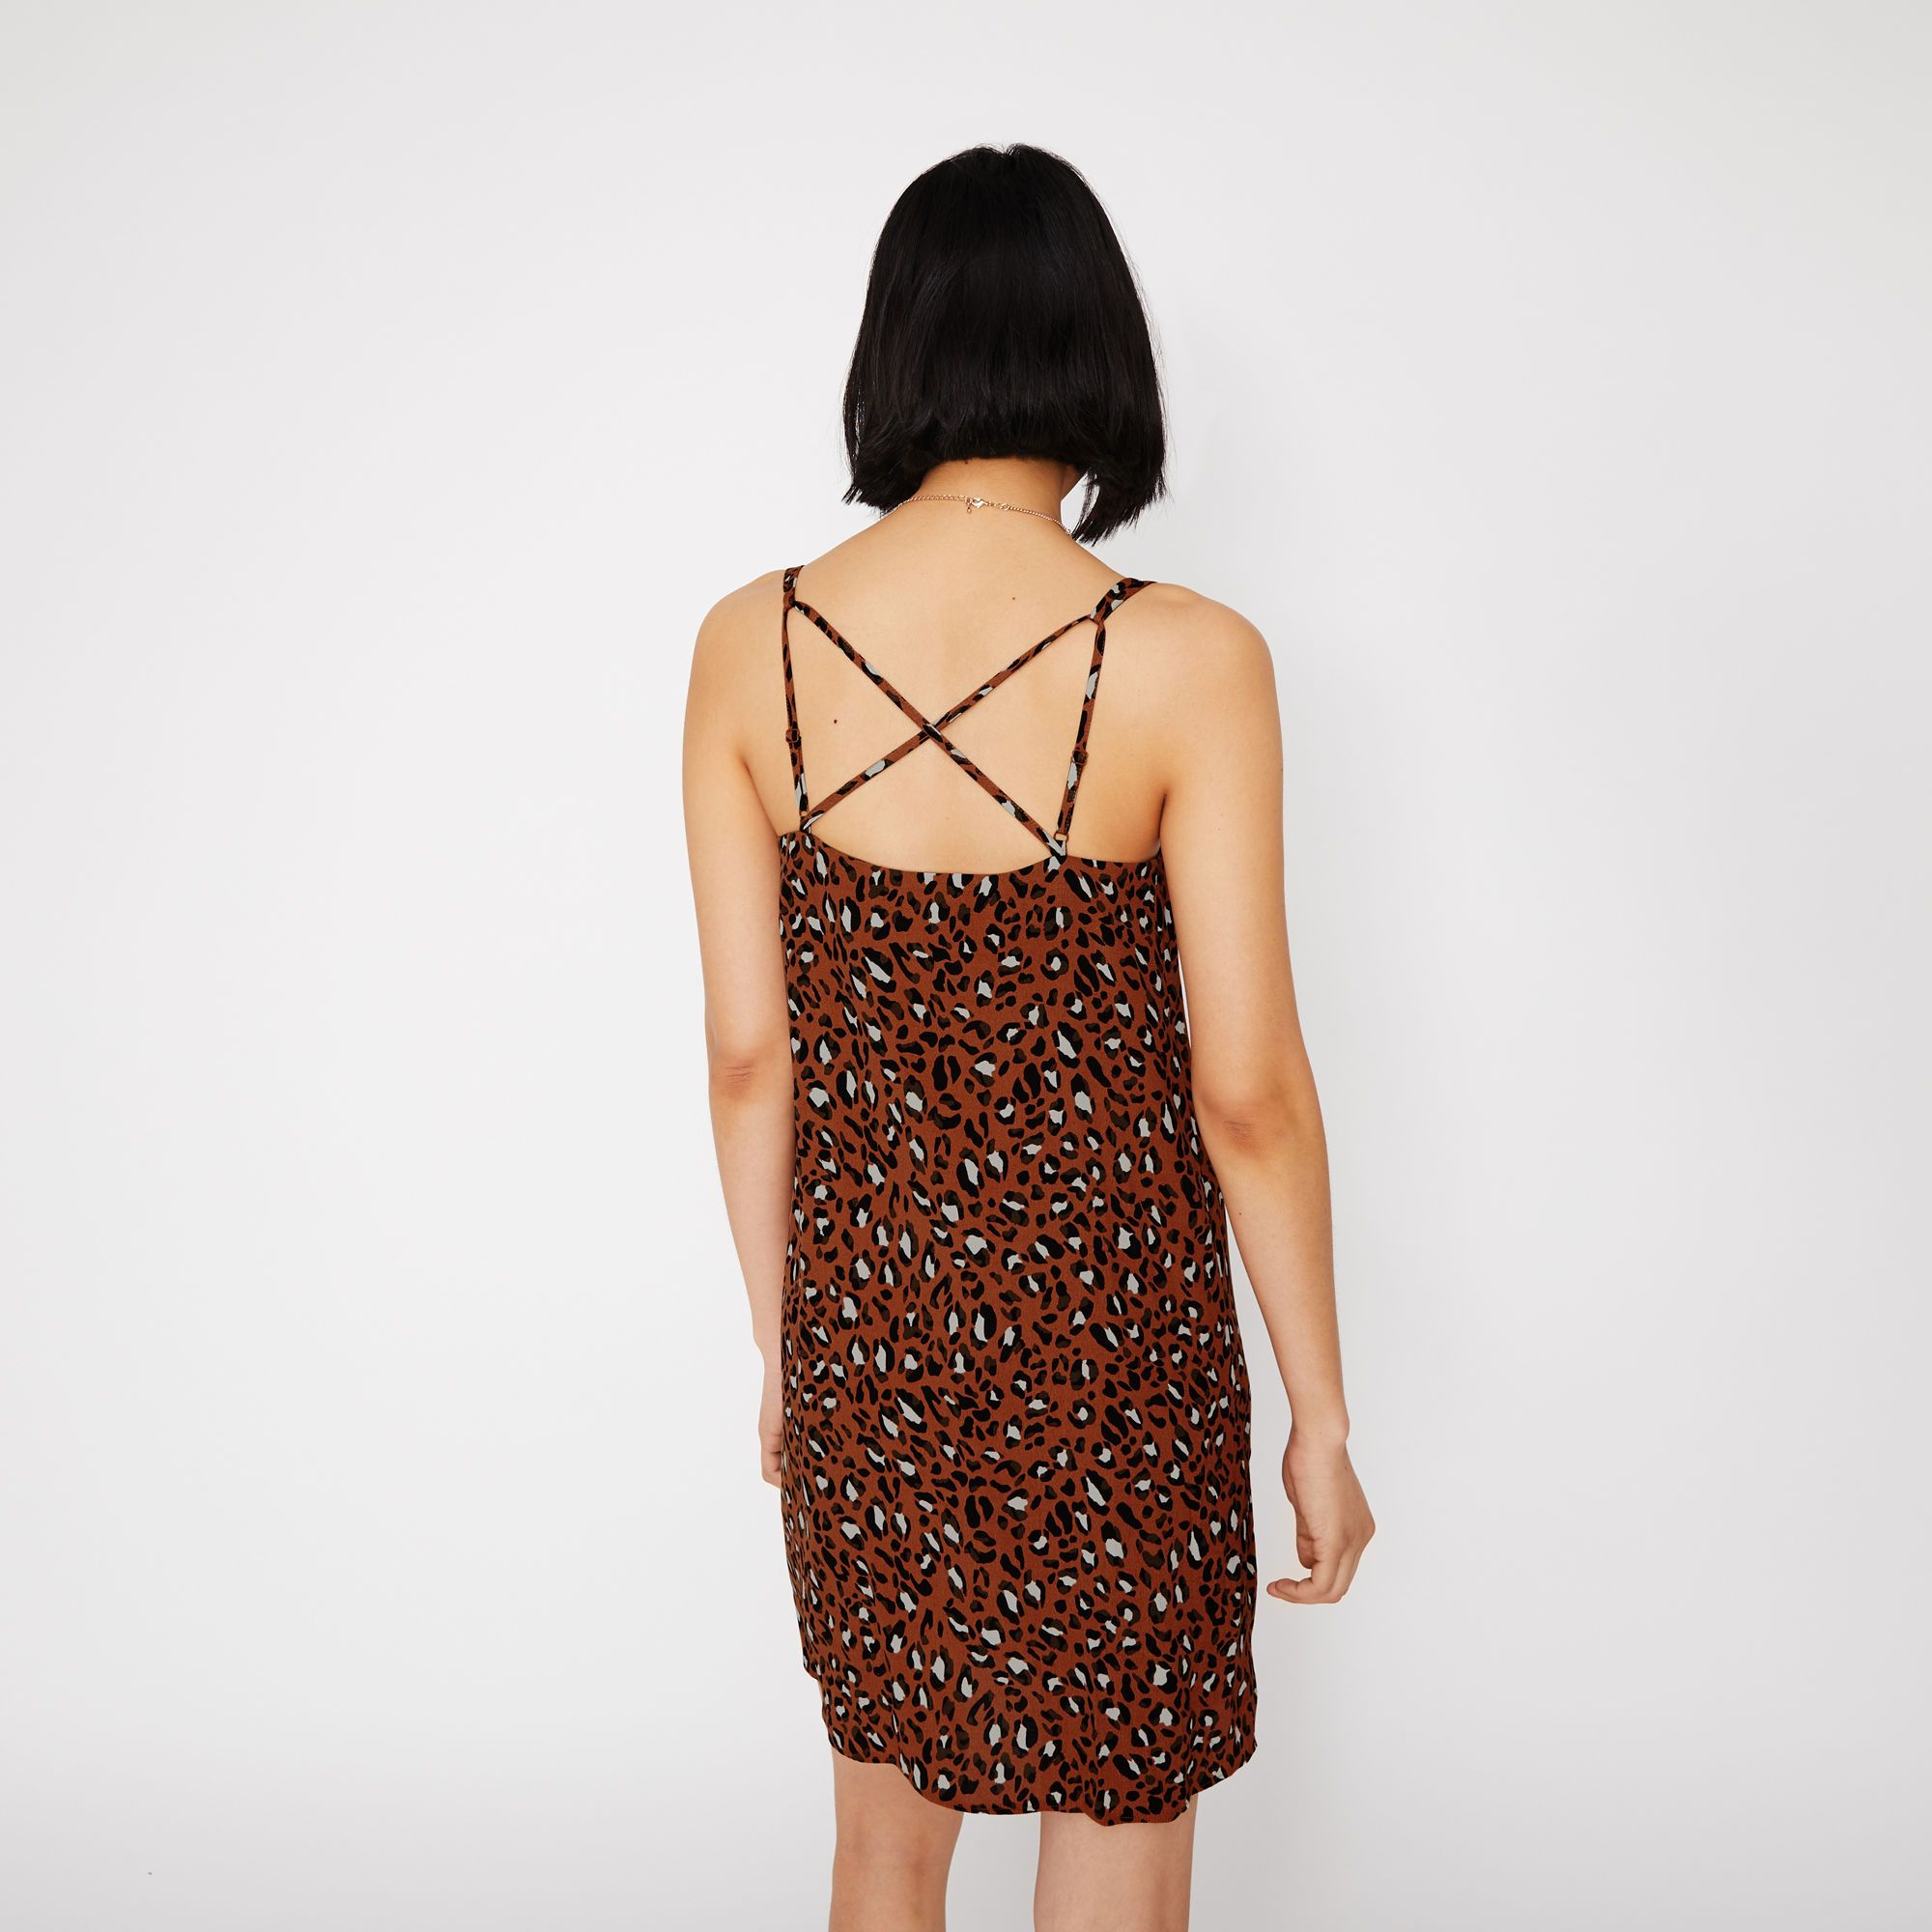 Warehouse Animal Cami Dress Tan 3 Long Summer Dresses Dresses Long Sleeve Dress [ 2000 x 2000 Pixel ]